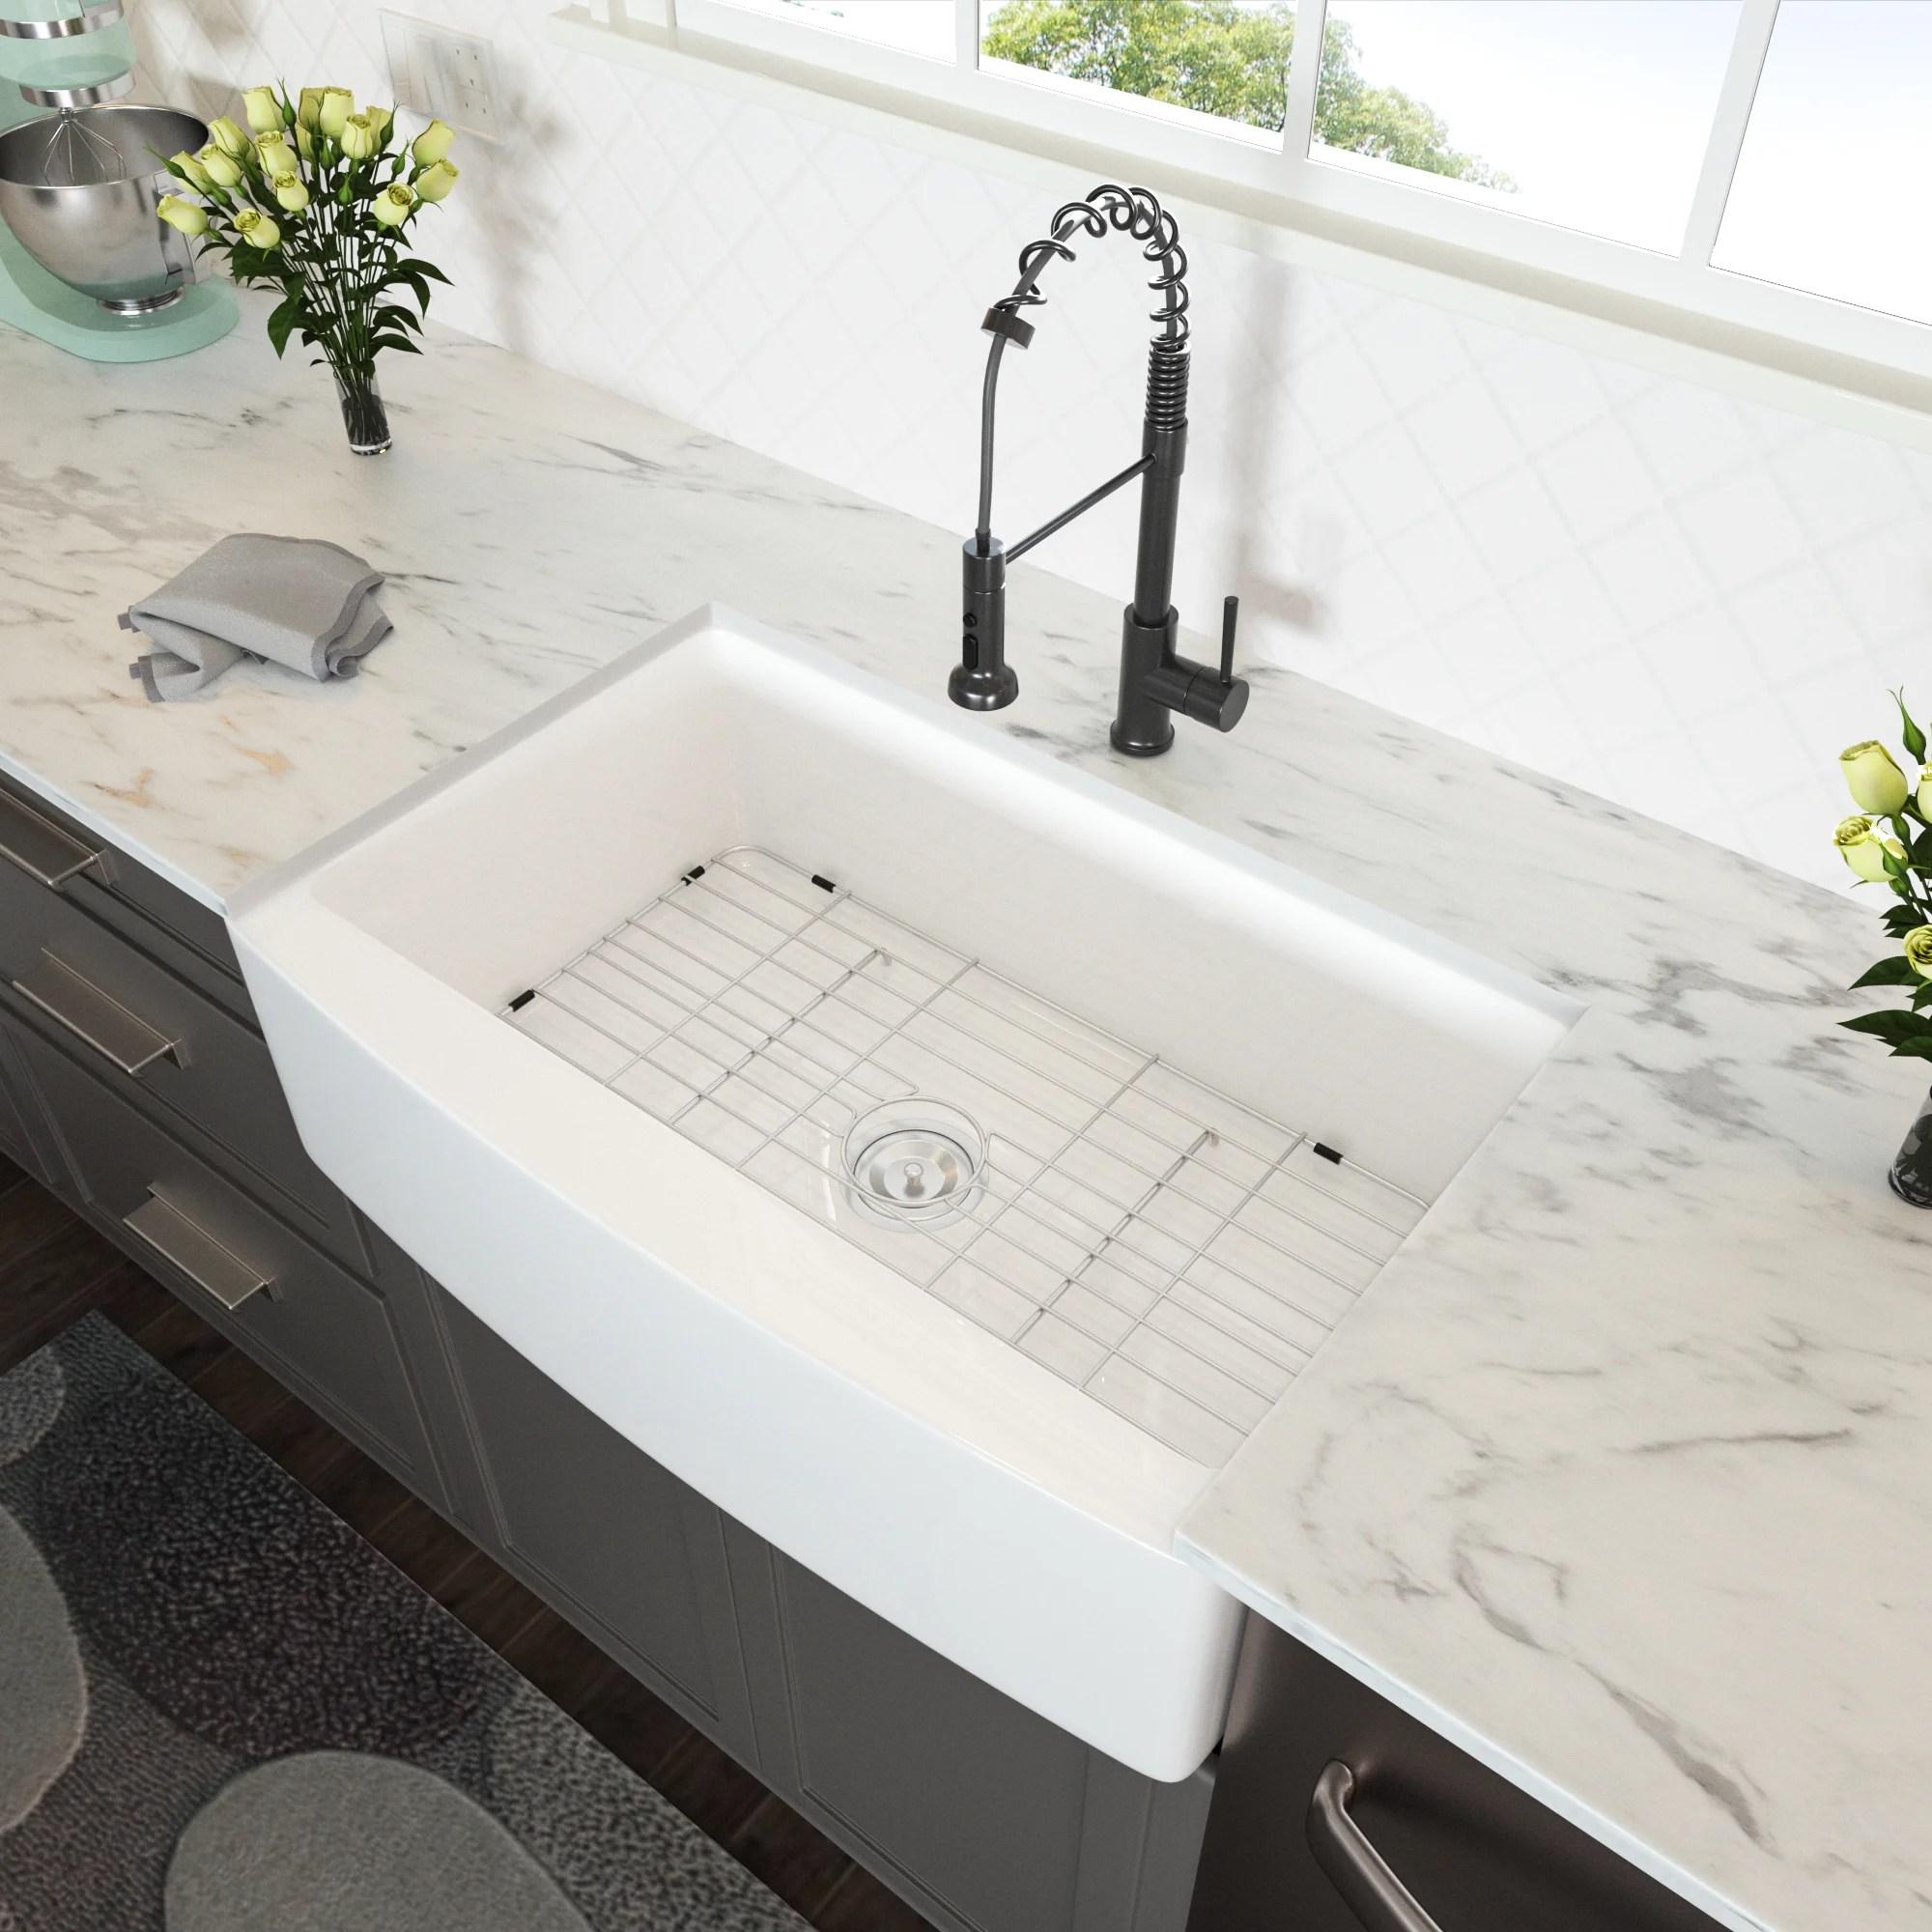 farmhouse sink white 24 inch apron front kitchen sink fireclay ceramic porcelain single bowl kitchen farm sinks